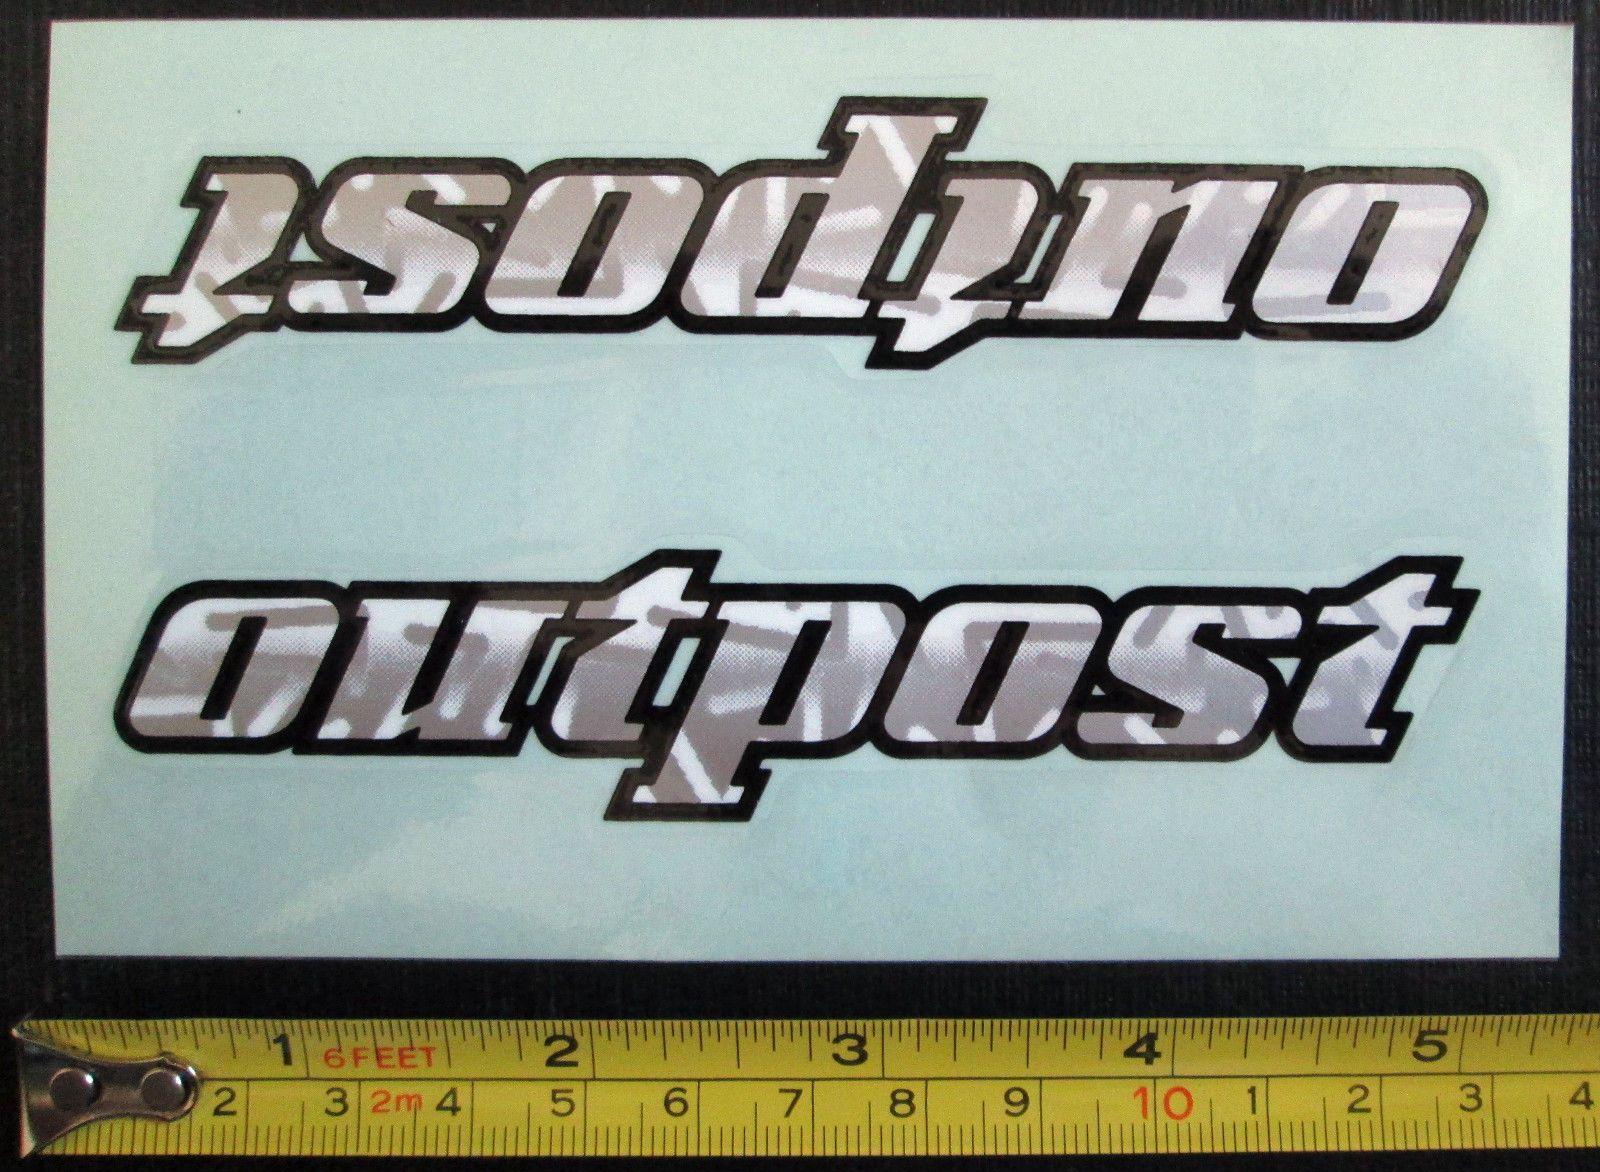 Set of 2 gt outpost sticker decals mountain bike silver gray white black ebay